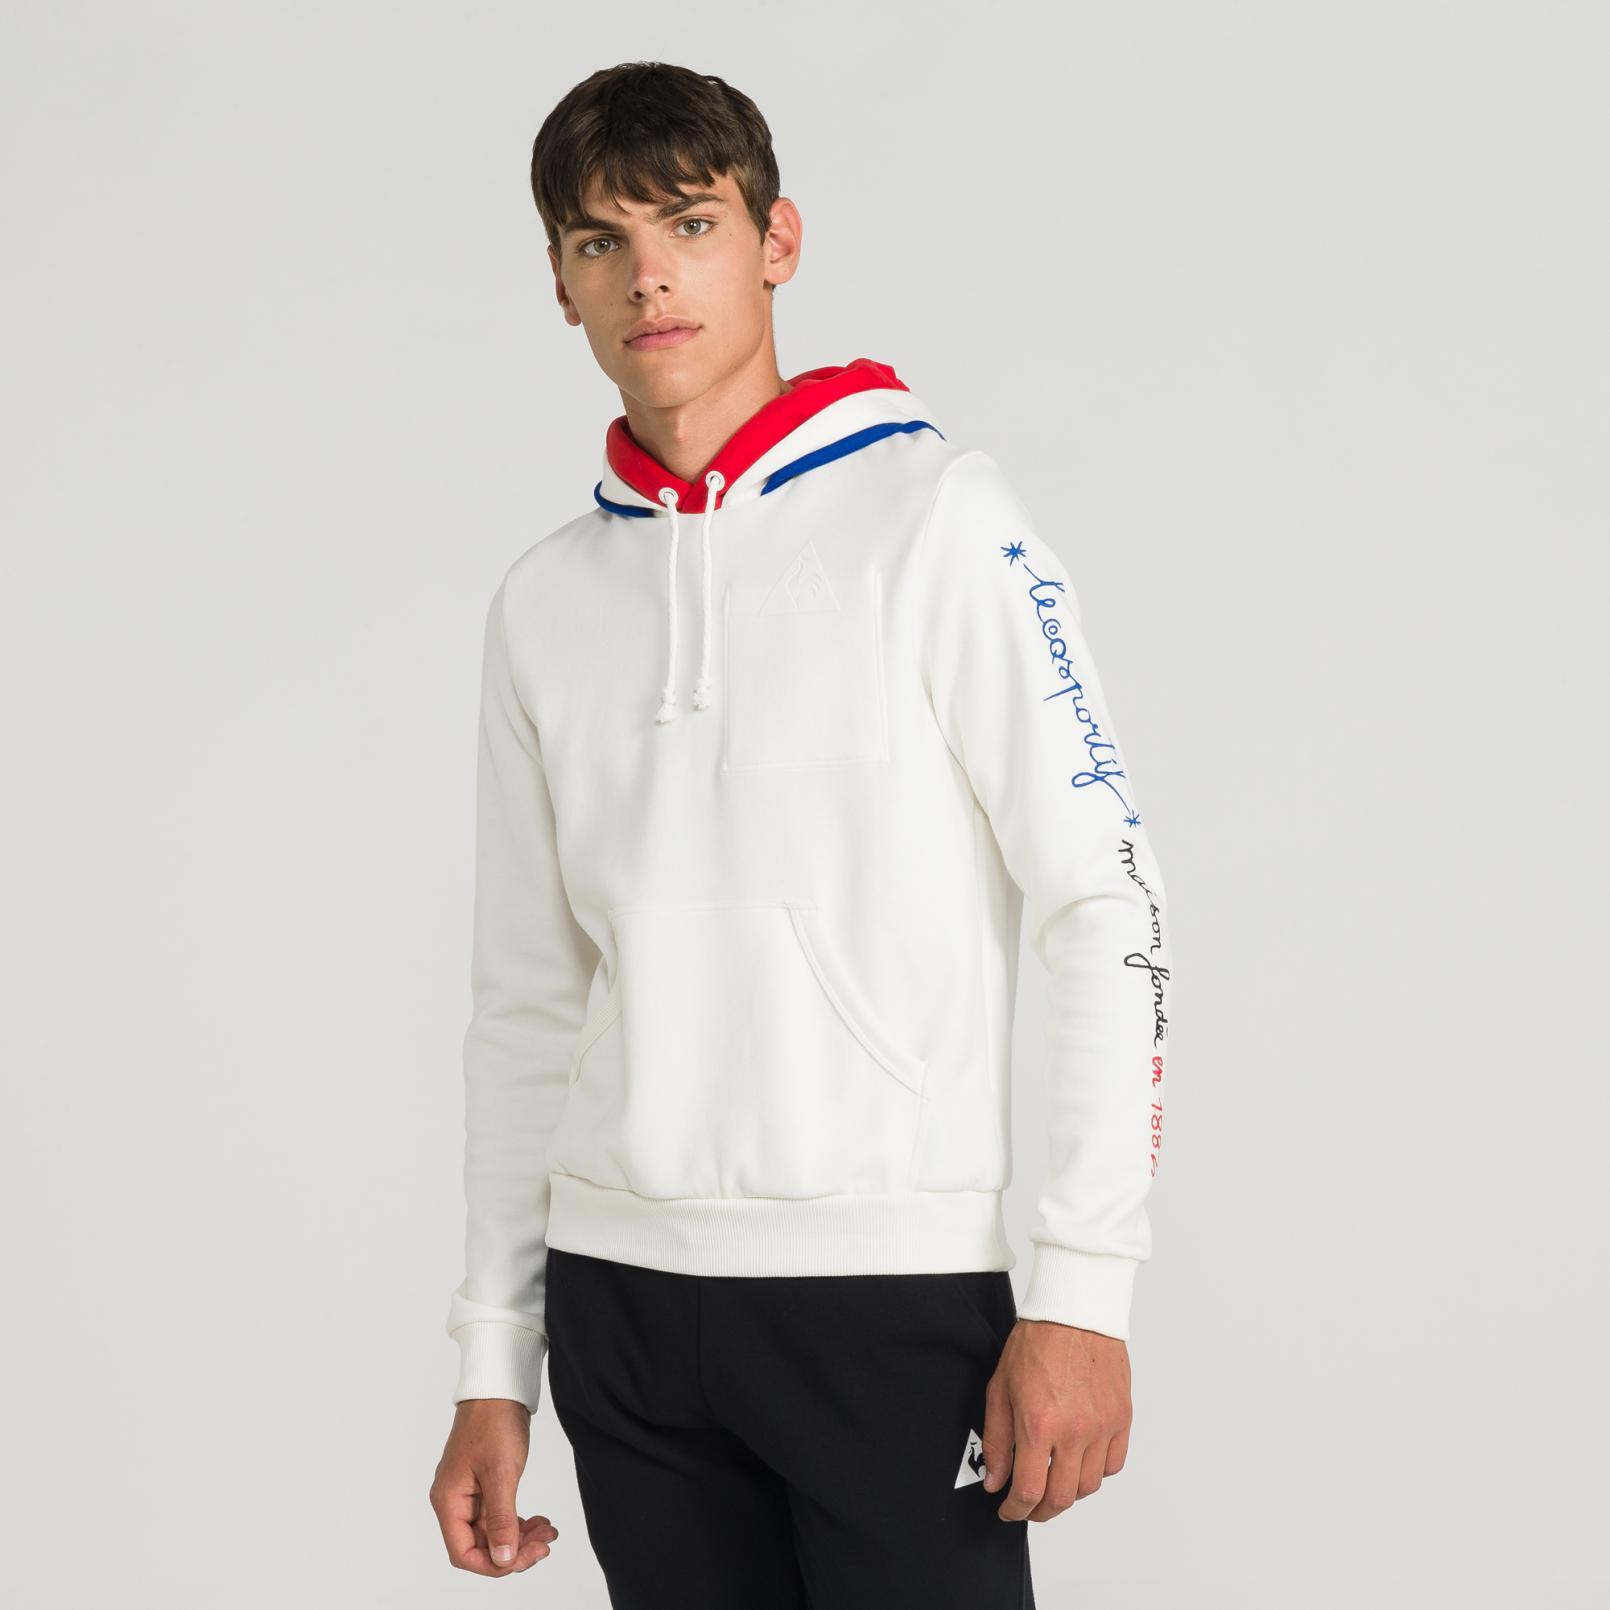 Sweat tops – Le Coq Sportif Tricolore 1882 Pull-over hood White